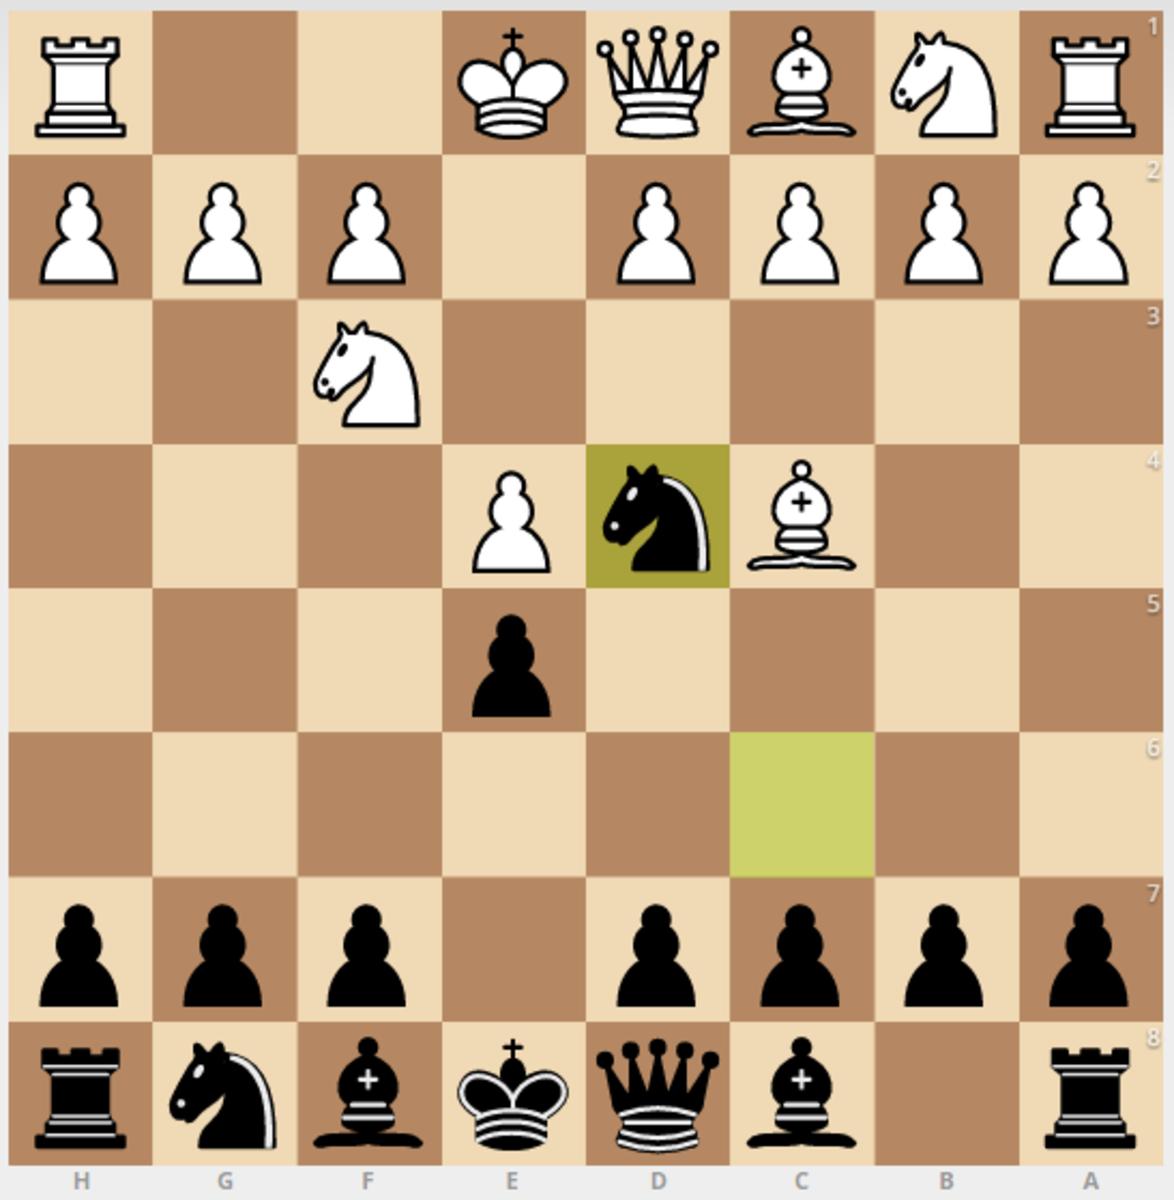 1. e4 e5 2. Nc3 Nf6 3. Bc4 Nd4 (Black's perspective)